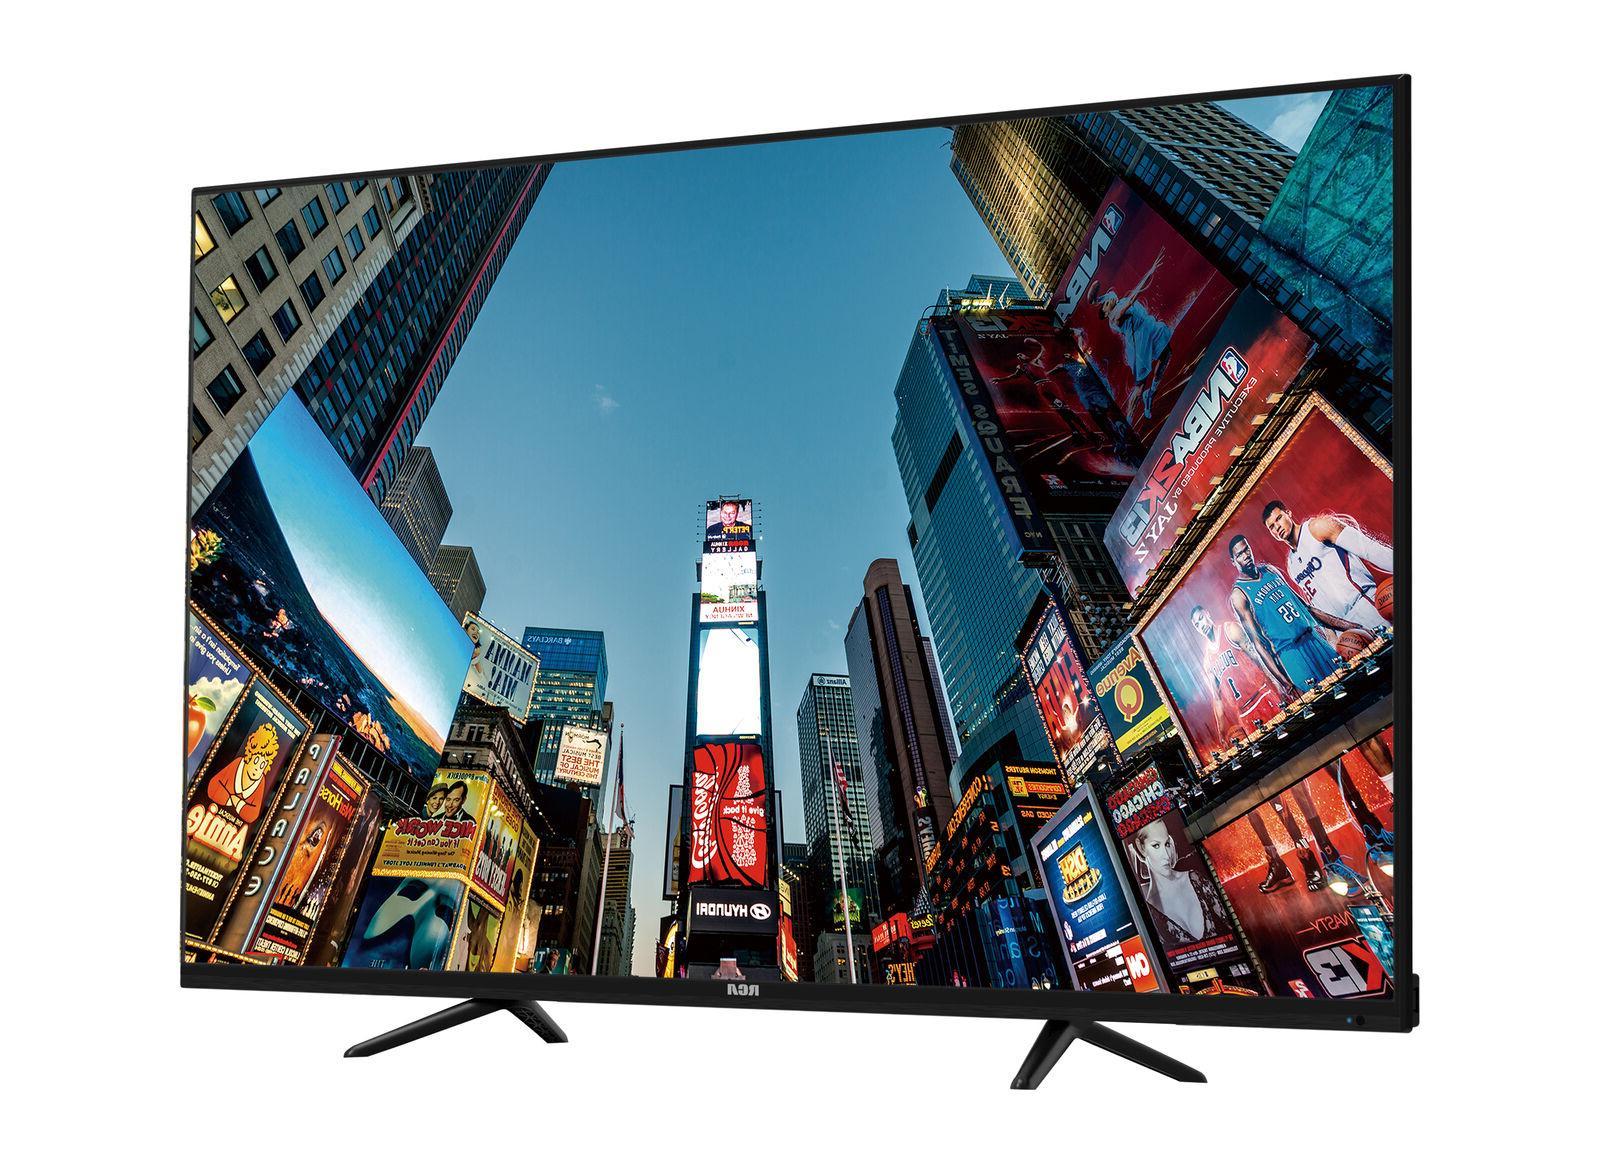 Polaroid inch LED Smart TV 3 HDMI USB HD 2160P NoTax